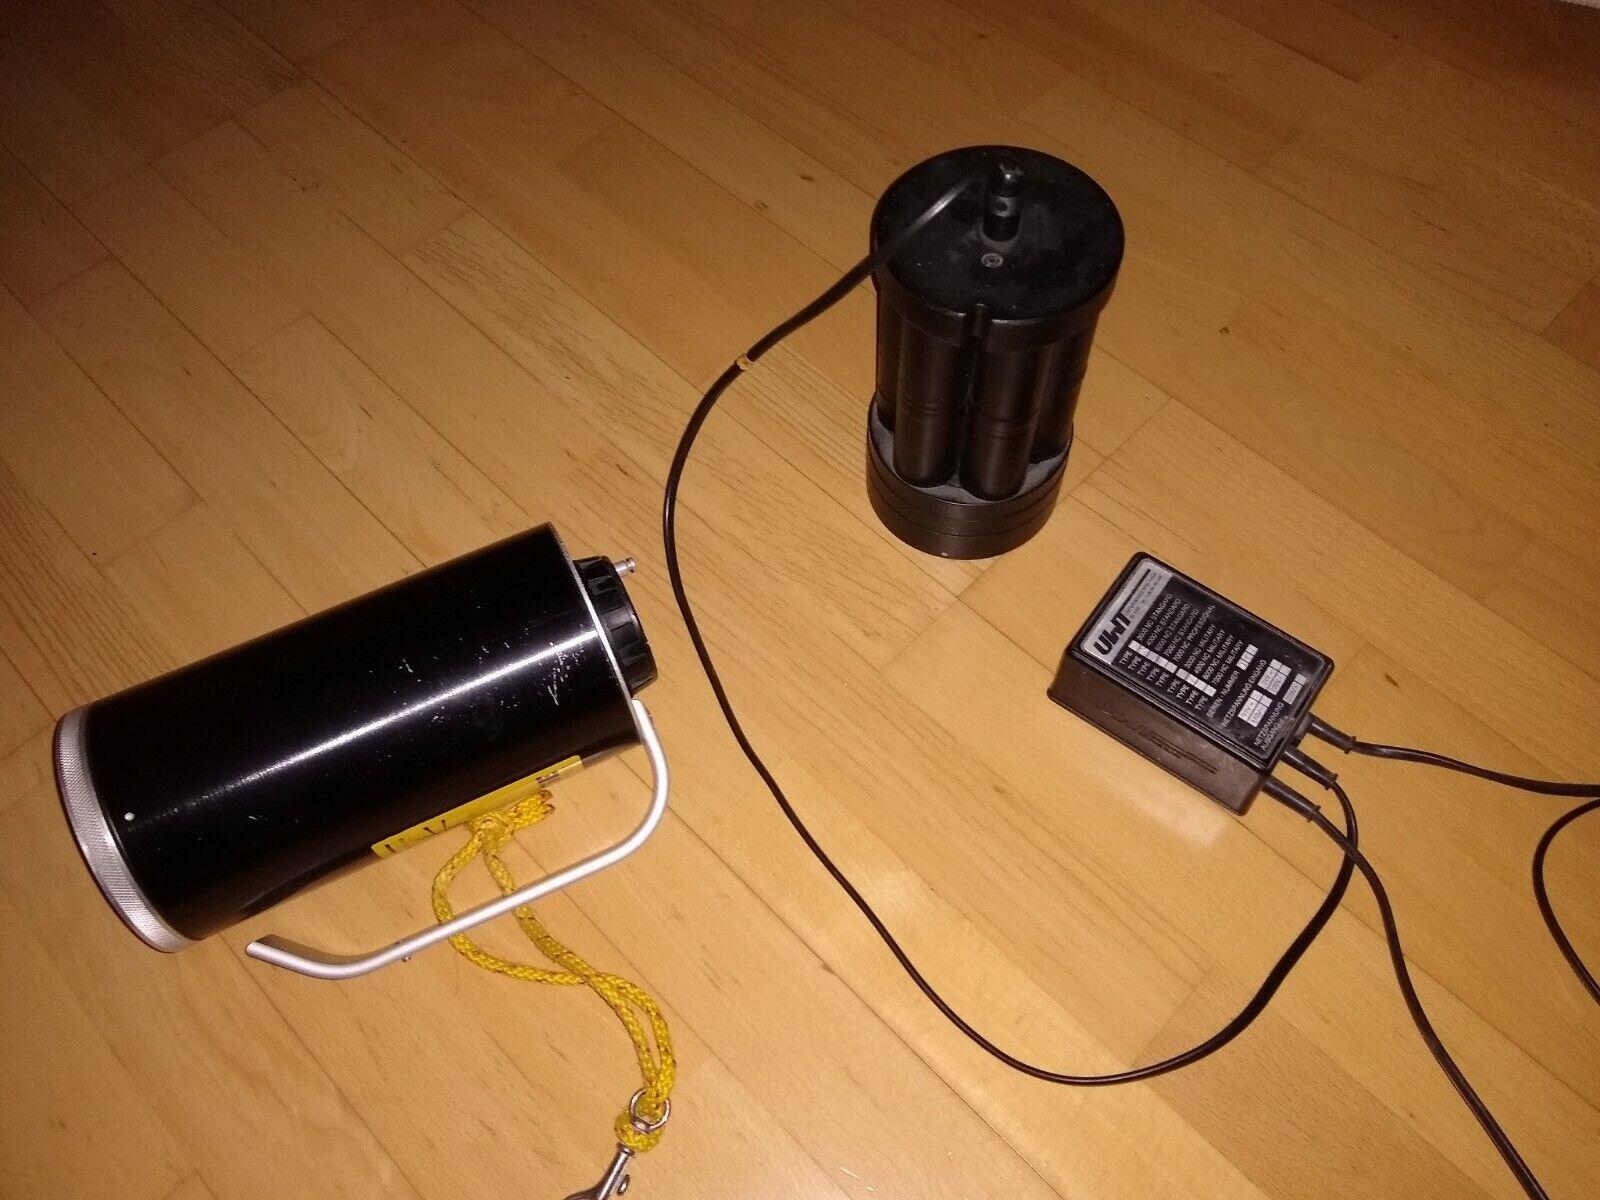 Tauchlampe Unterwasserlampe UW-Lampe Blase Blase Blase 4000NC 6b41a4